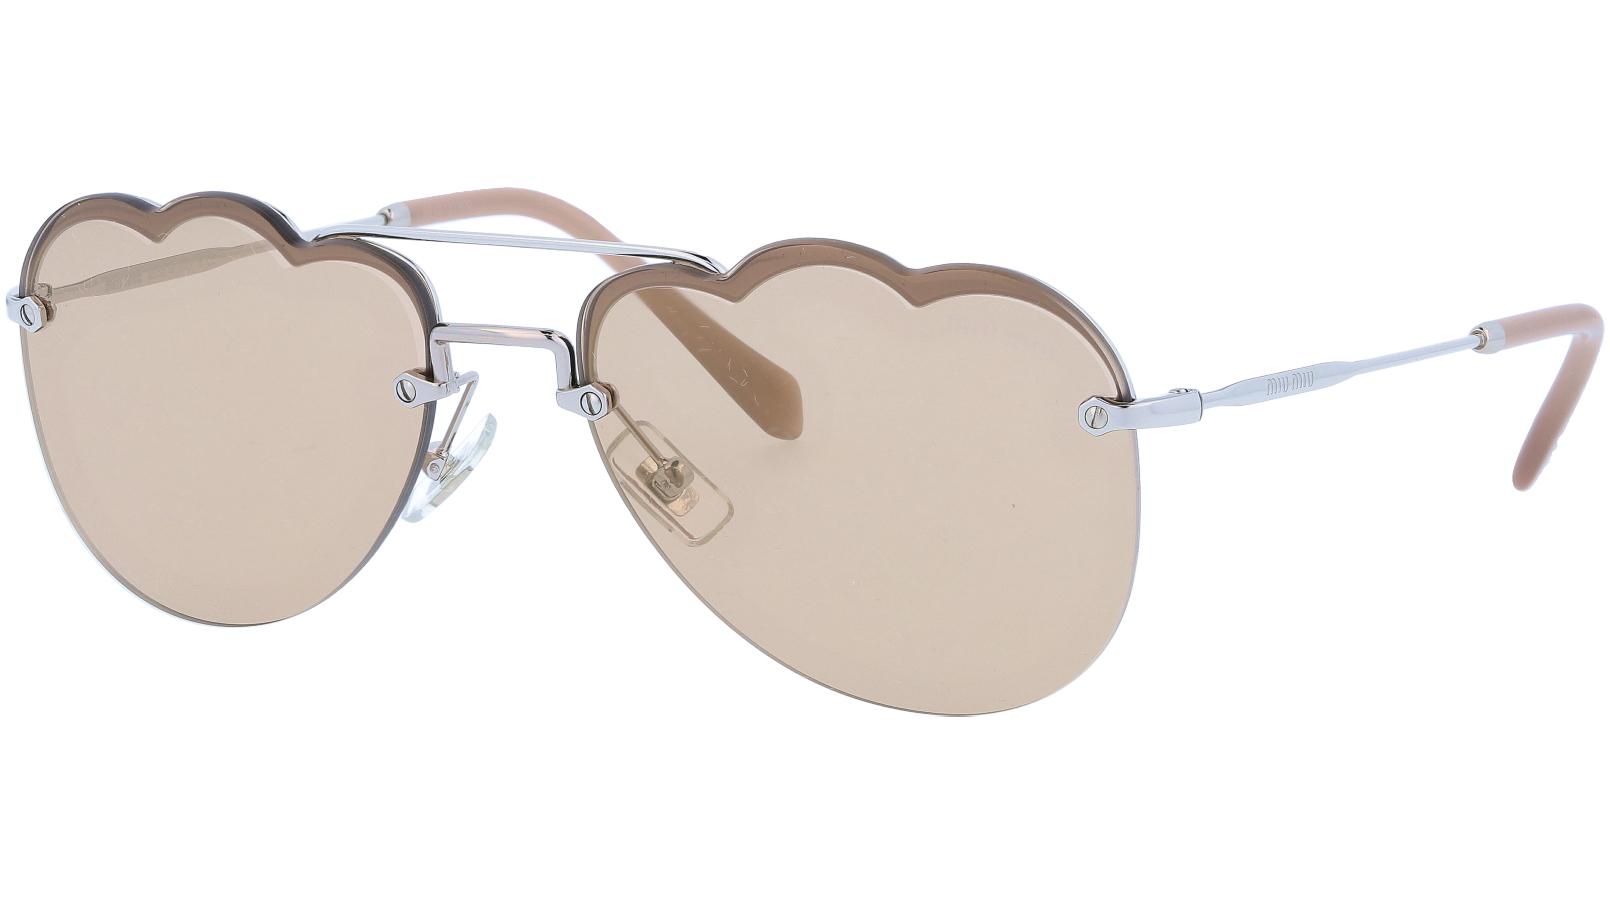 Miu Miu MU56US 1BC176 58 Brown Sunglasses